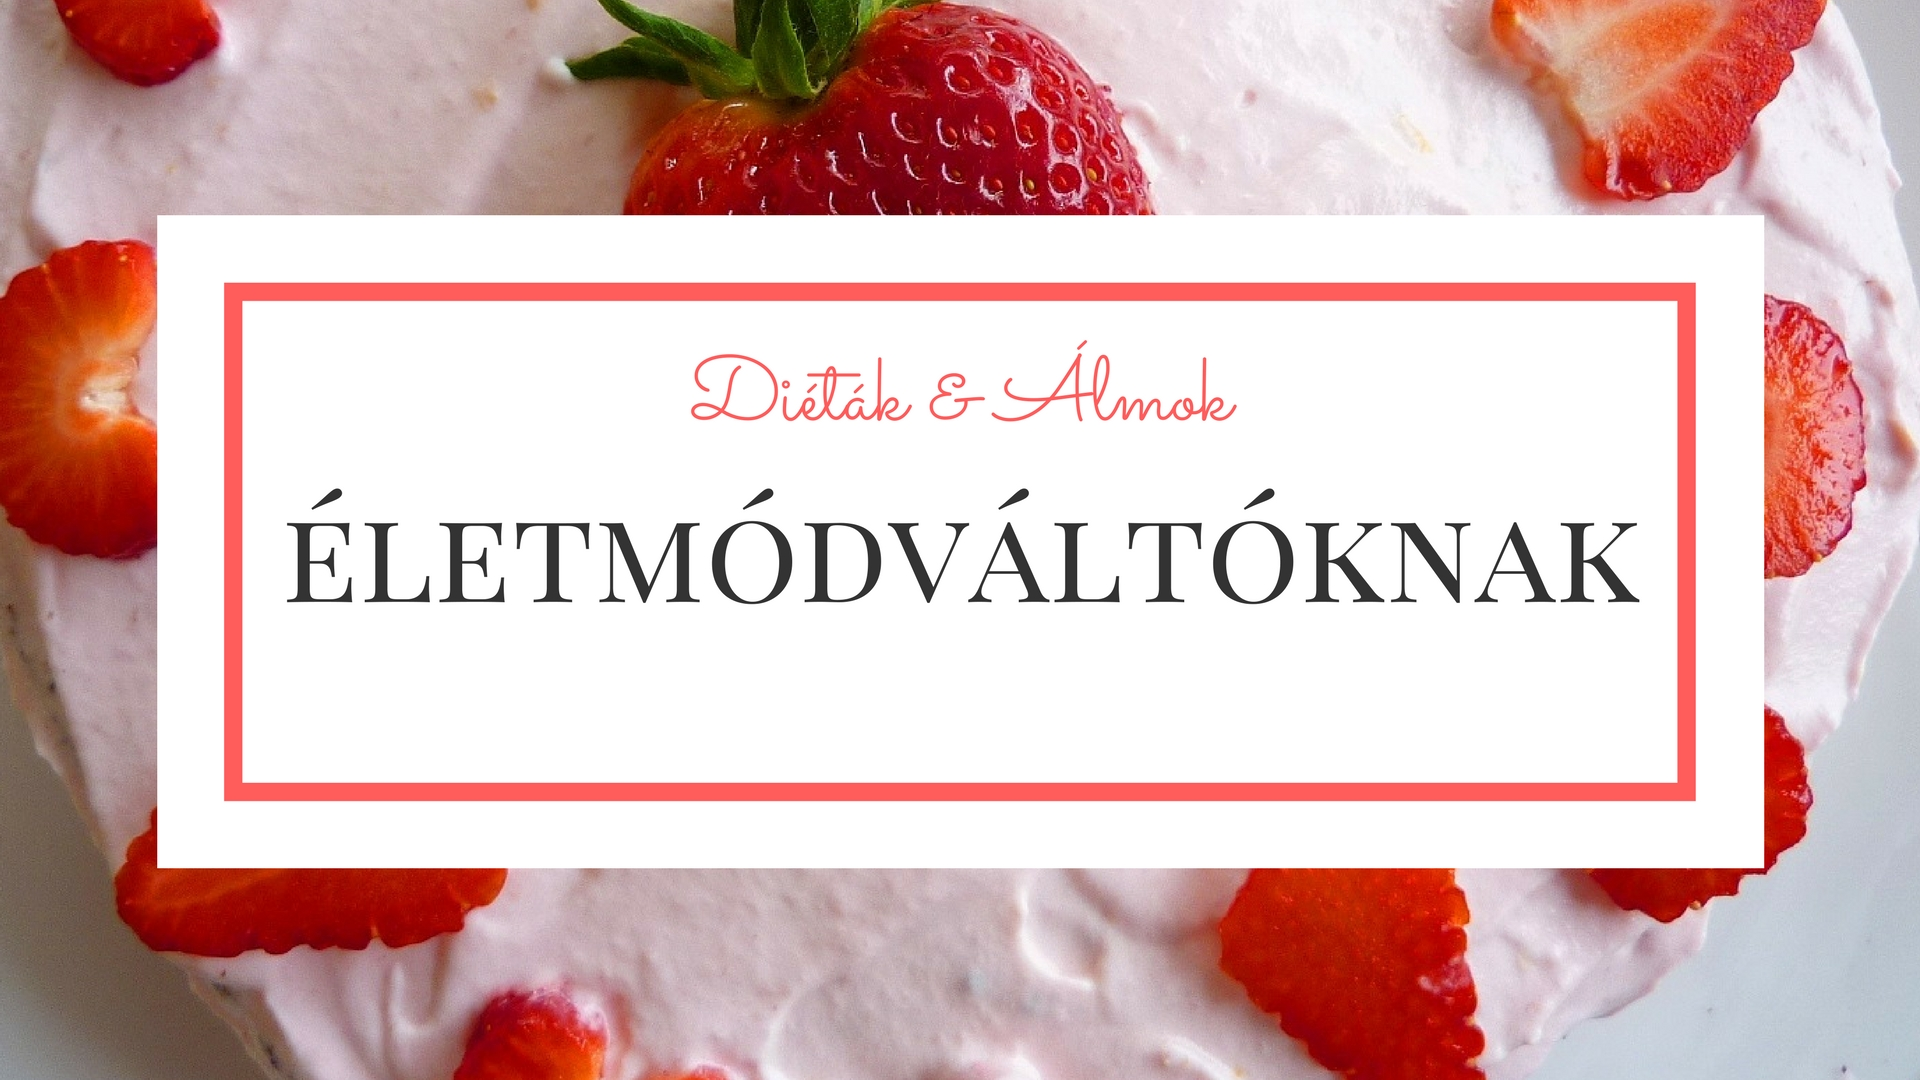 dietak_almok_szenhidrat_dieta_tanfolyamok_eletmodvaltoknak_blog.jpg